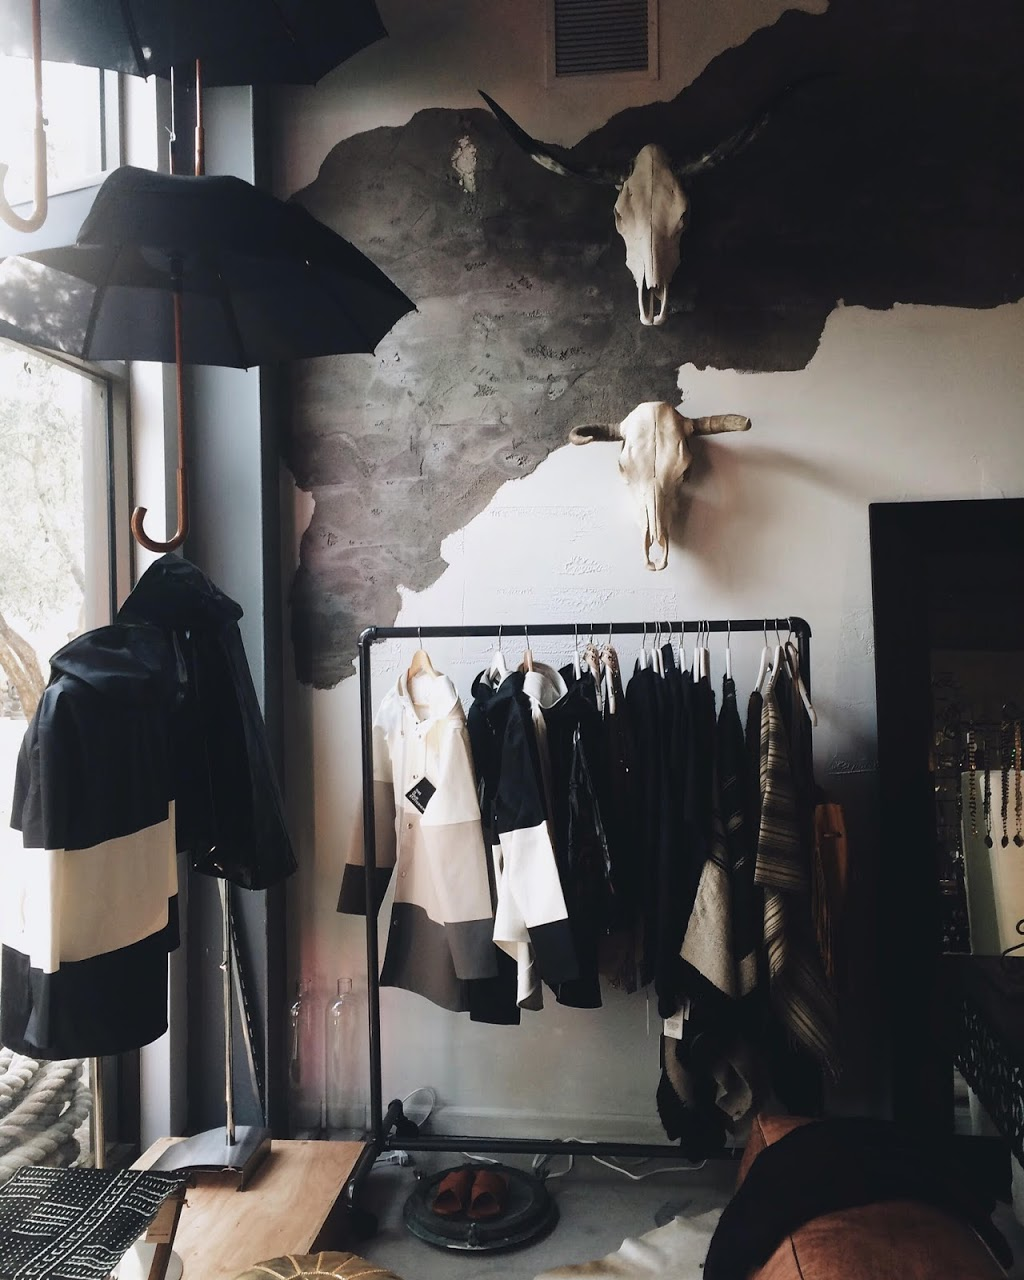 Nomad Chic - clothing store    Photo 8 of 10   Address: 23570 Arnold Dr, Sonoma, CA 95476, USA   Phone: (415) 381-9087